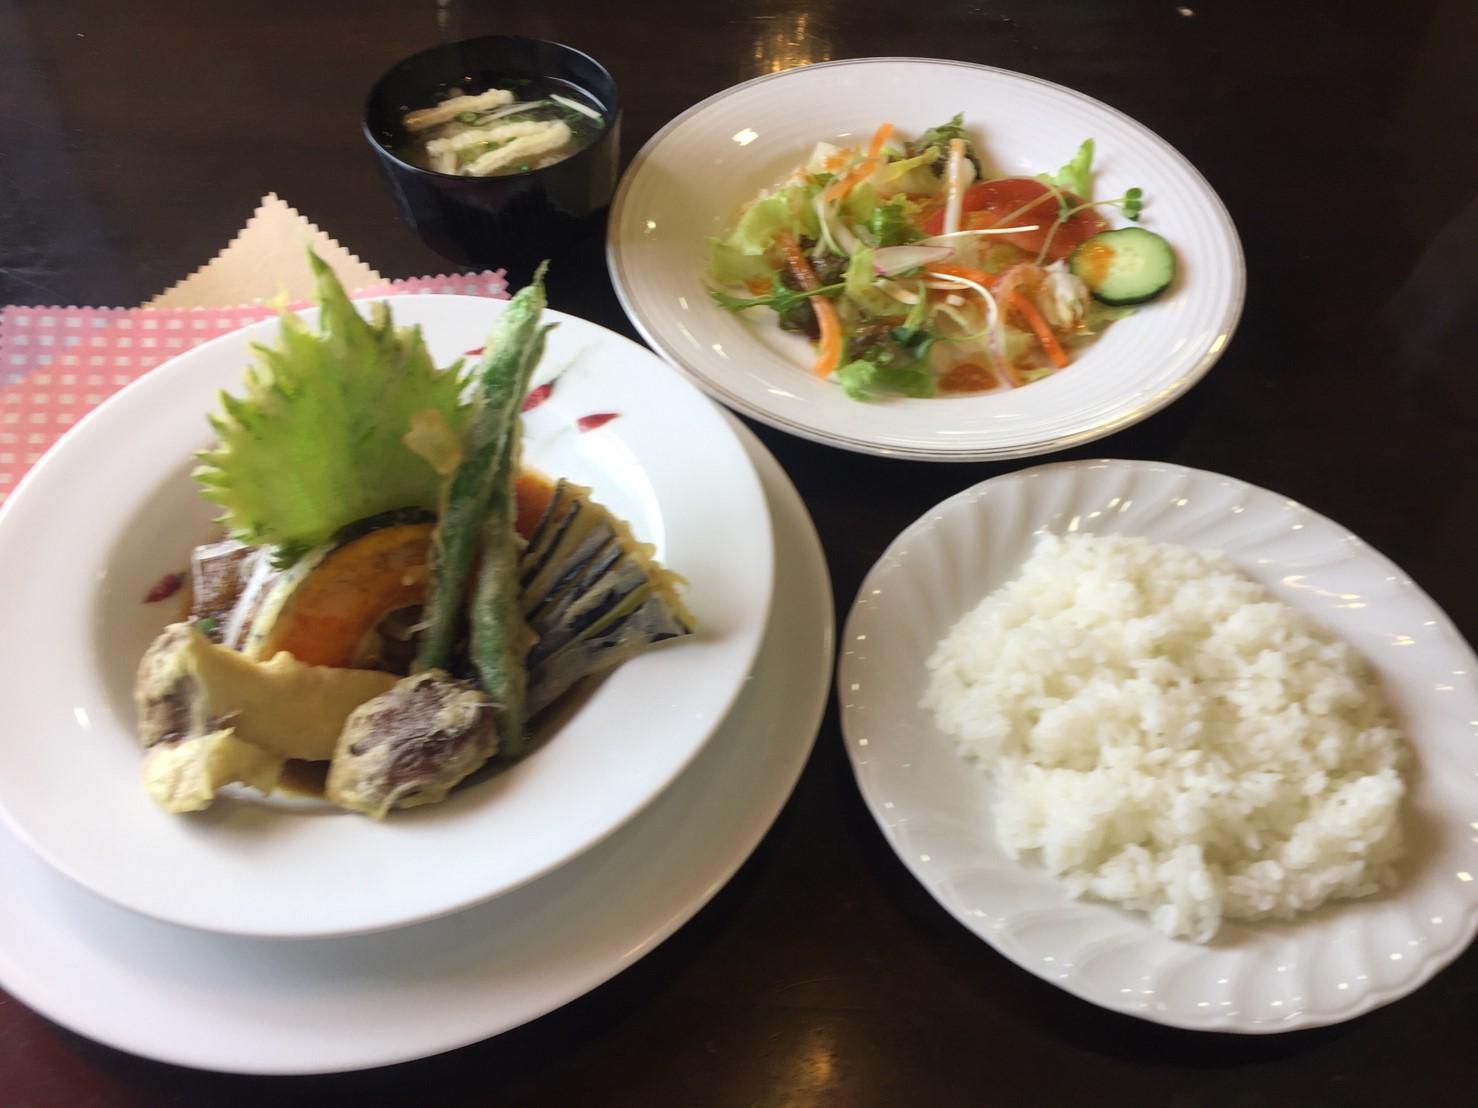 cafe & restaurant アンドリュース 日替わりランチ  ラス1和風ハンバーグ_e0115904_19370229.jpg